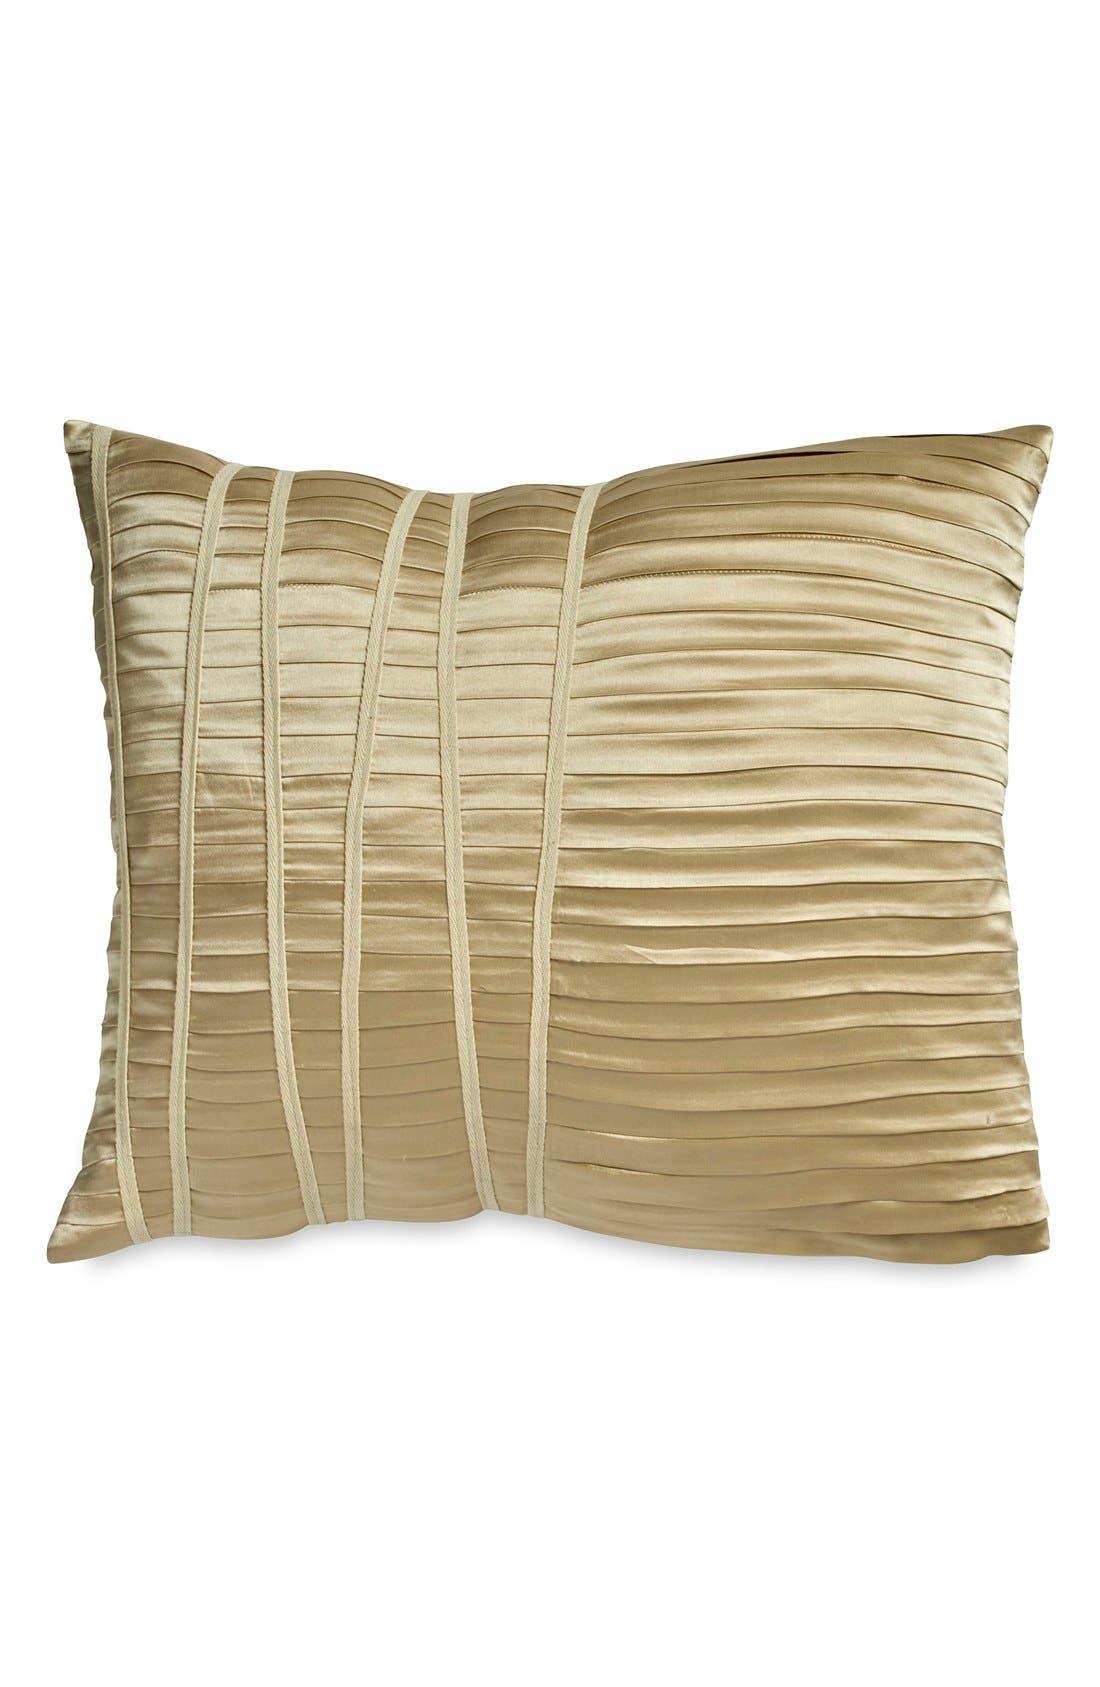 Donna Karan Collection 'Reflection' Accent Pillow